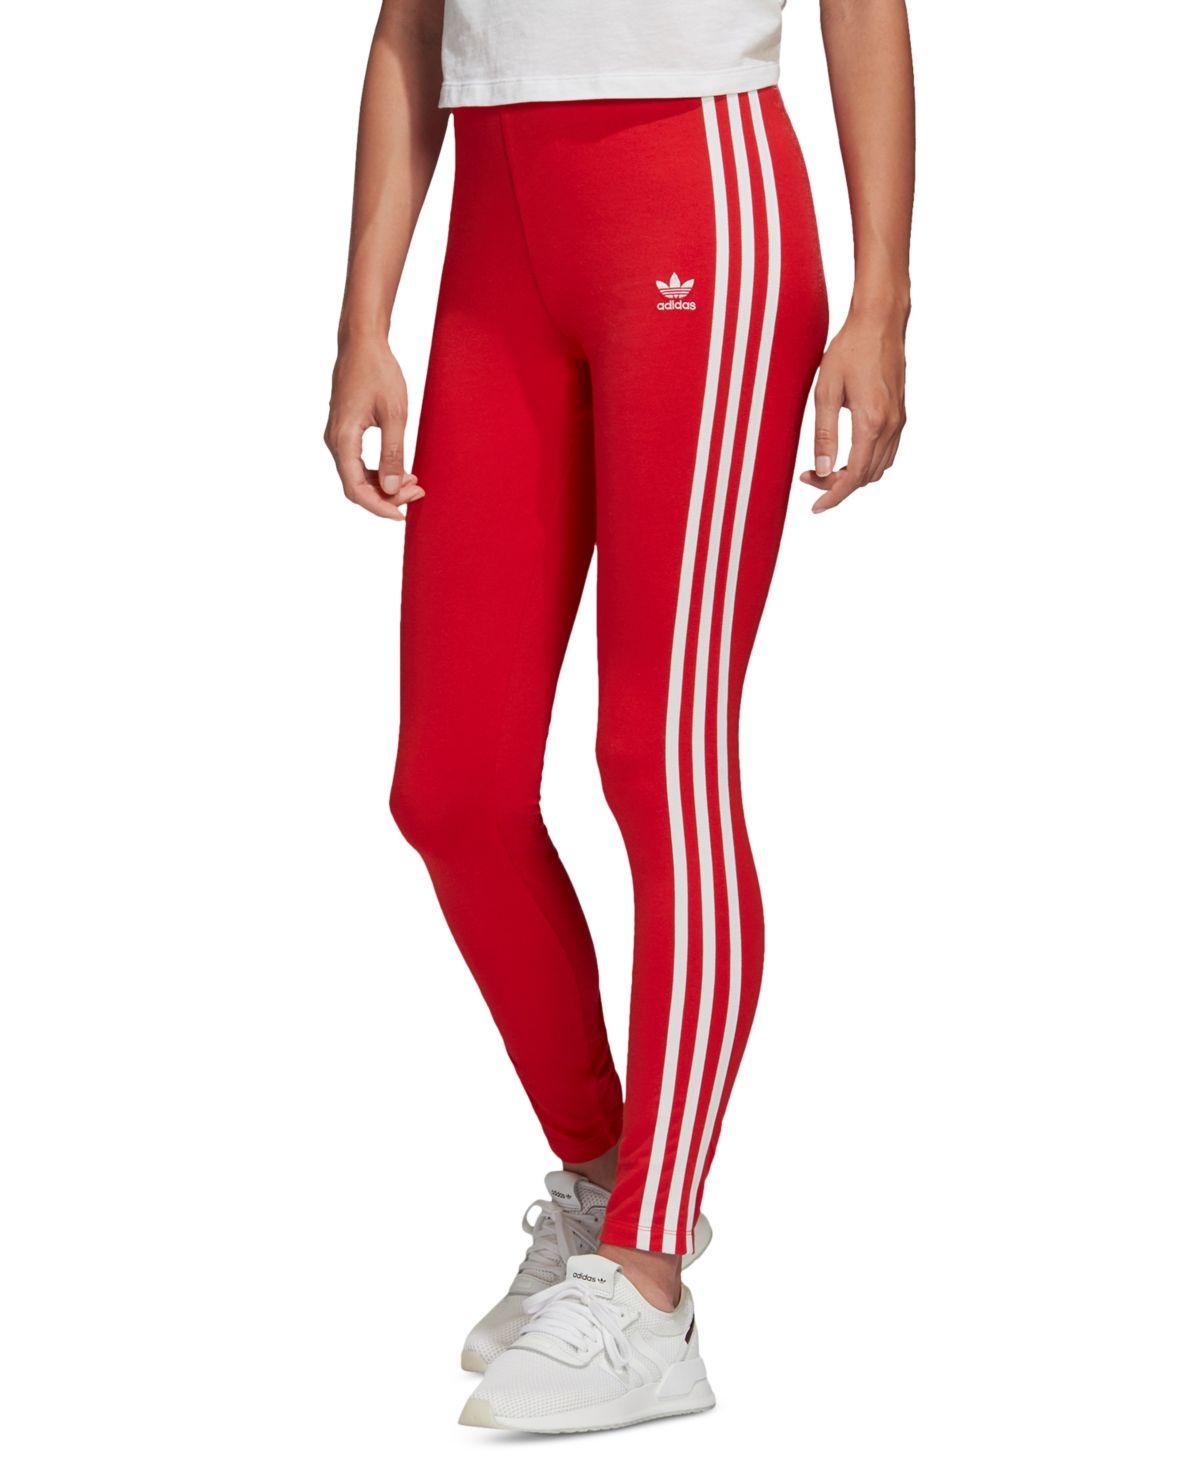 adidas Women's adicolor 3-Stripe Leggings & Reviews - Women - Macy's #stripedleggings